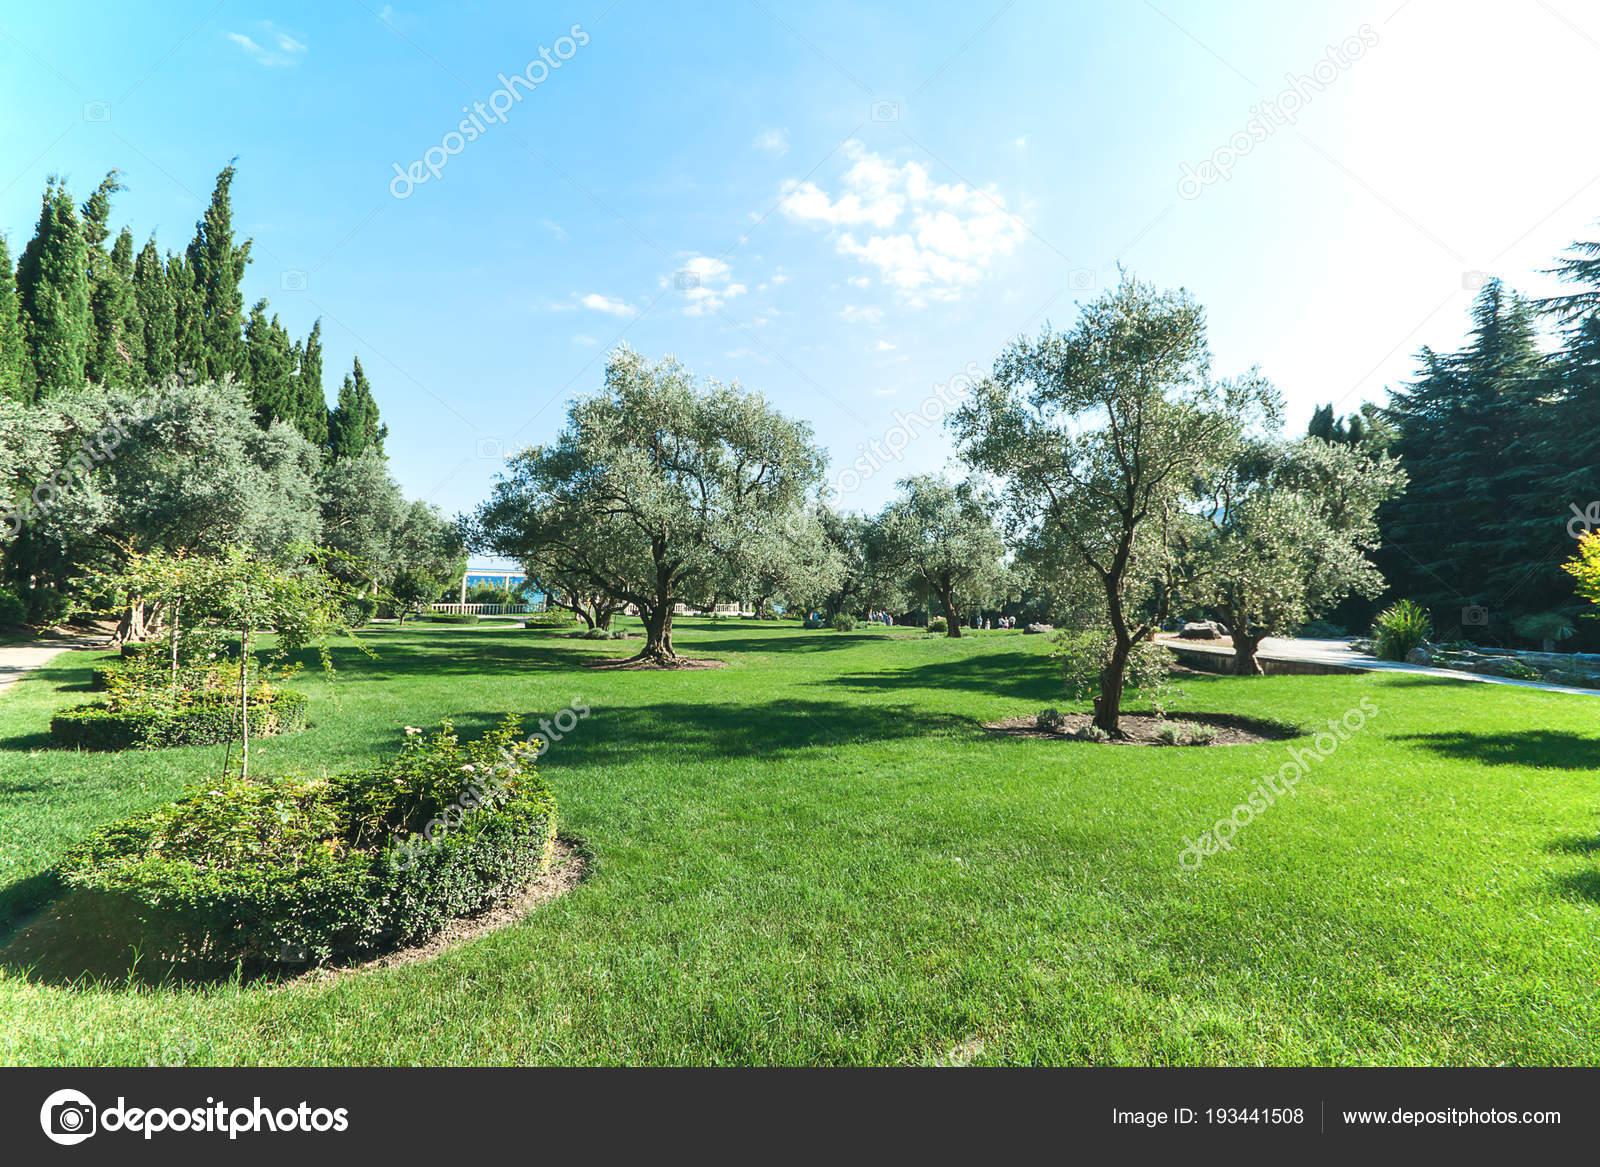 Beautiful Park With Path In Suumer Day Blue Sky Garden Design Landscape Background Stock Photo C N Samorodskaia 193441508